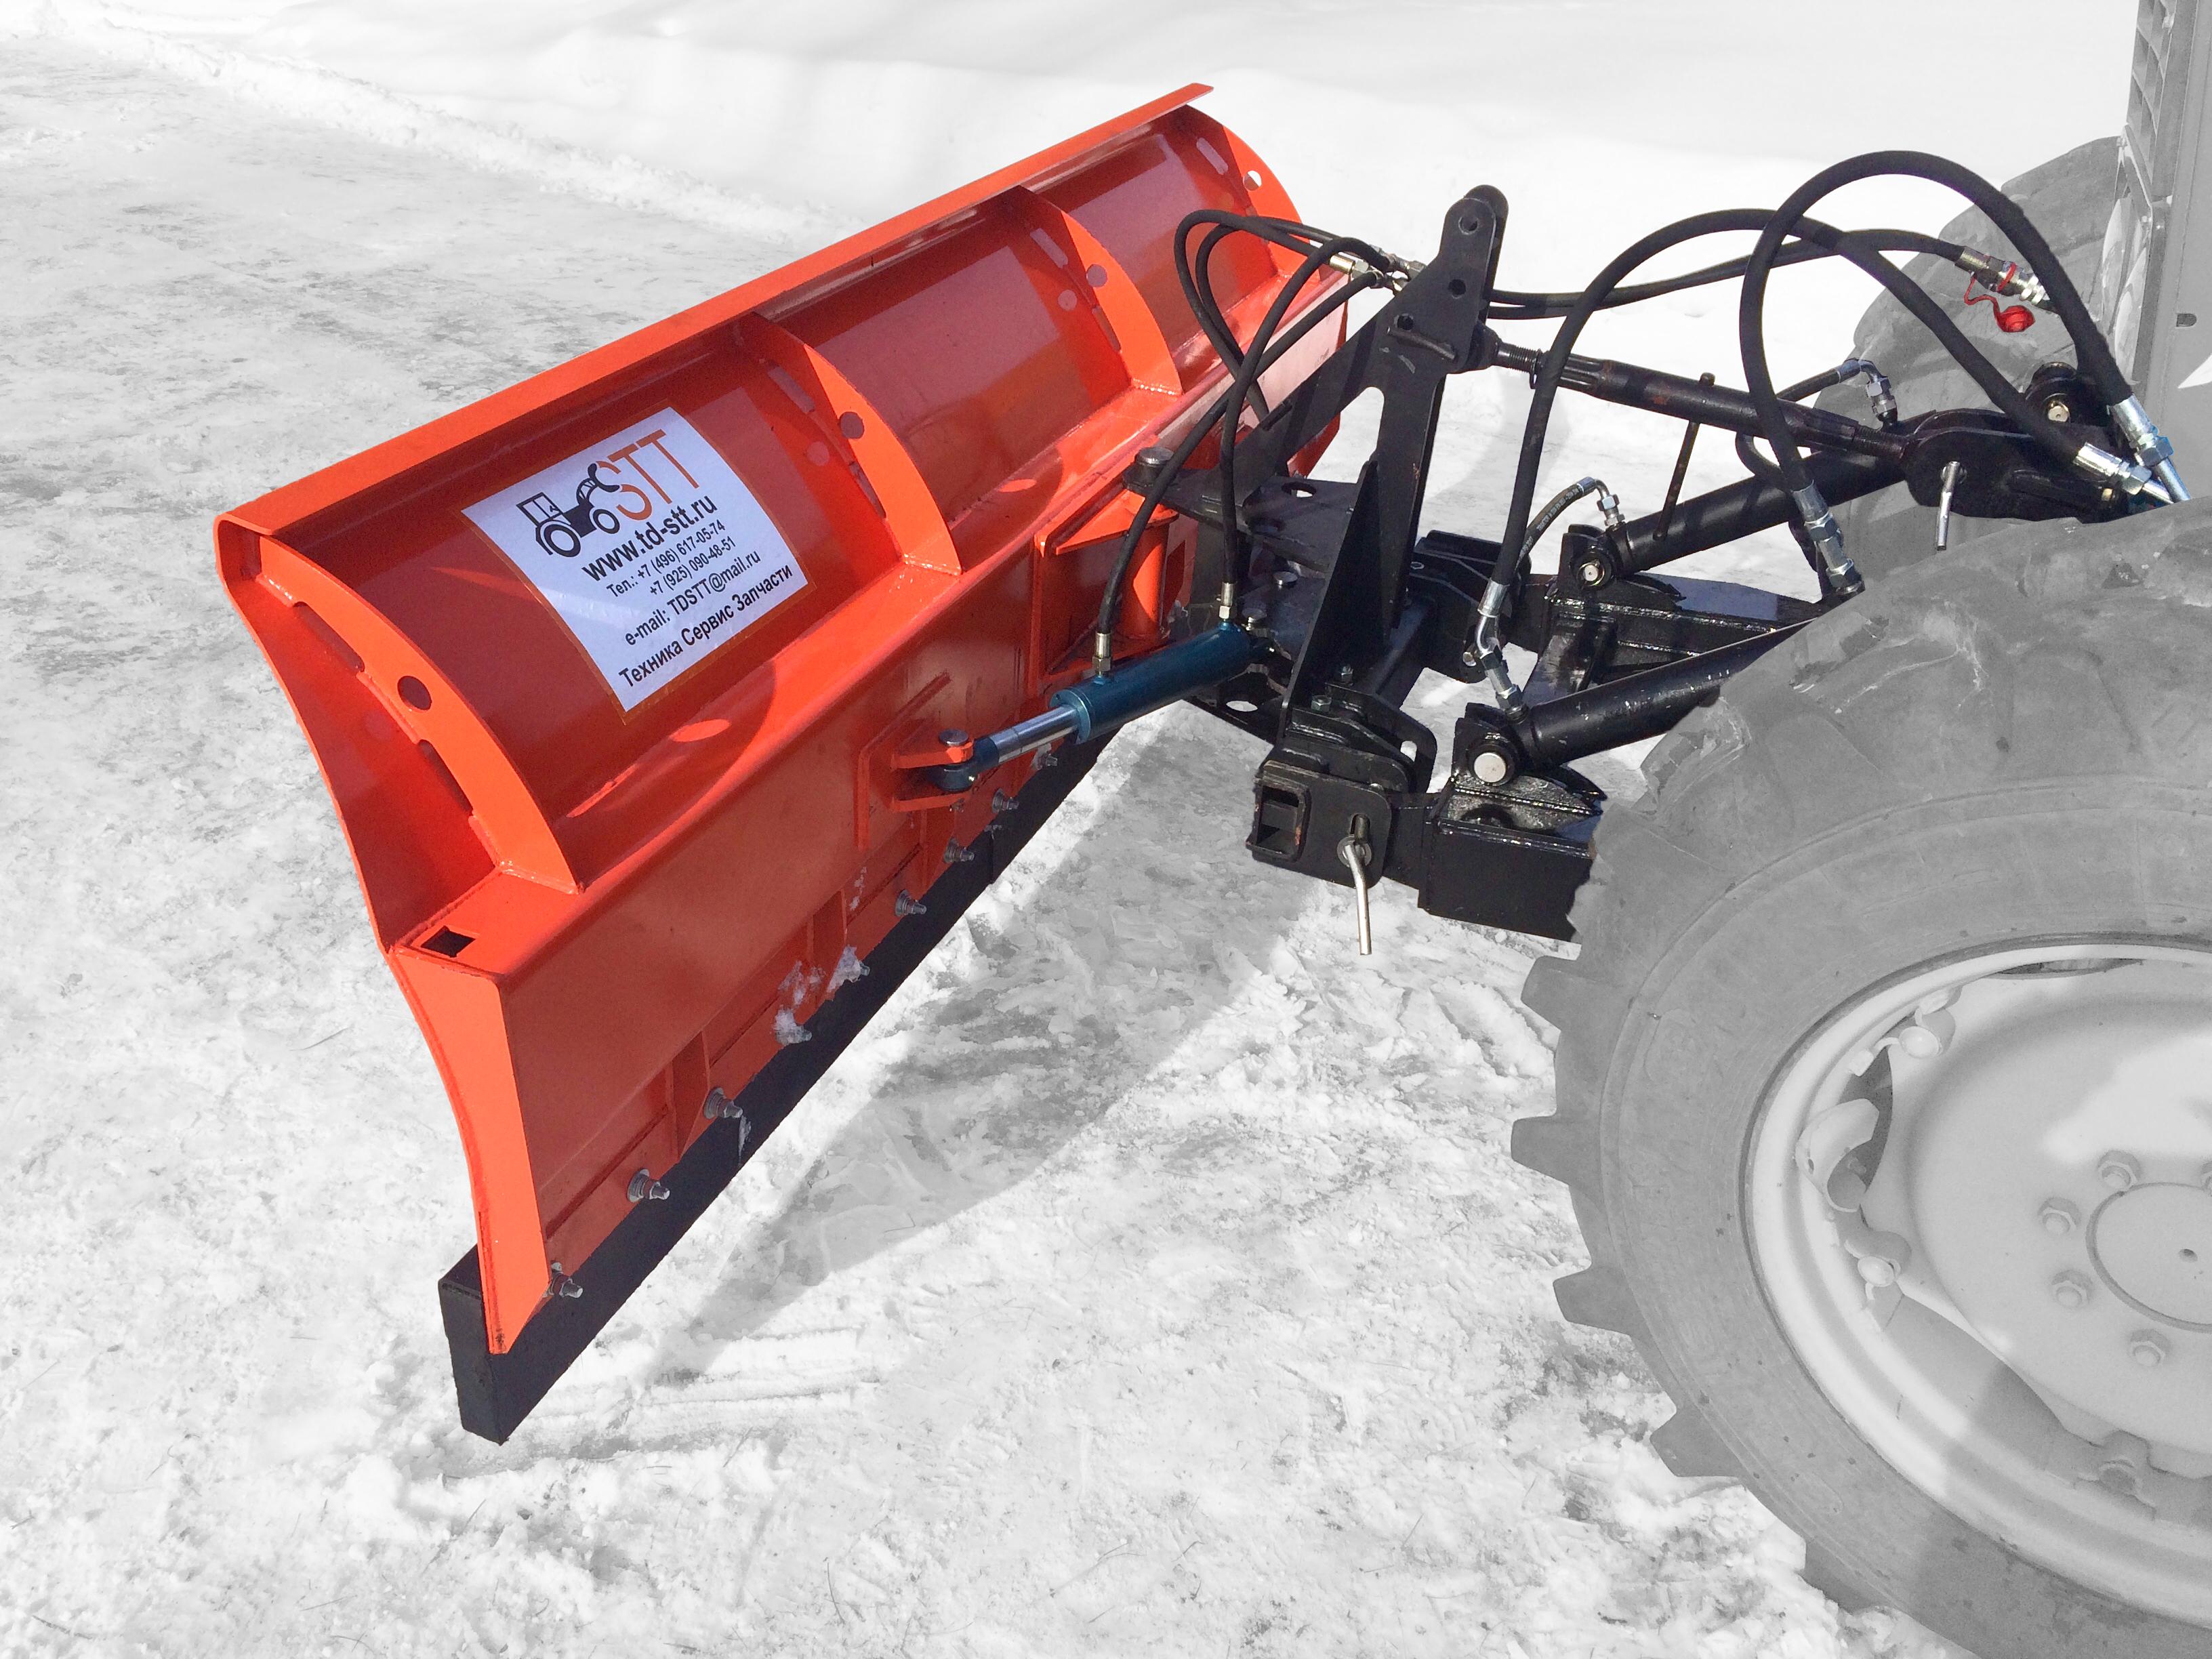 03260-20.000.00 gardena скрепер для уборки снега